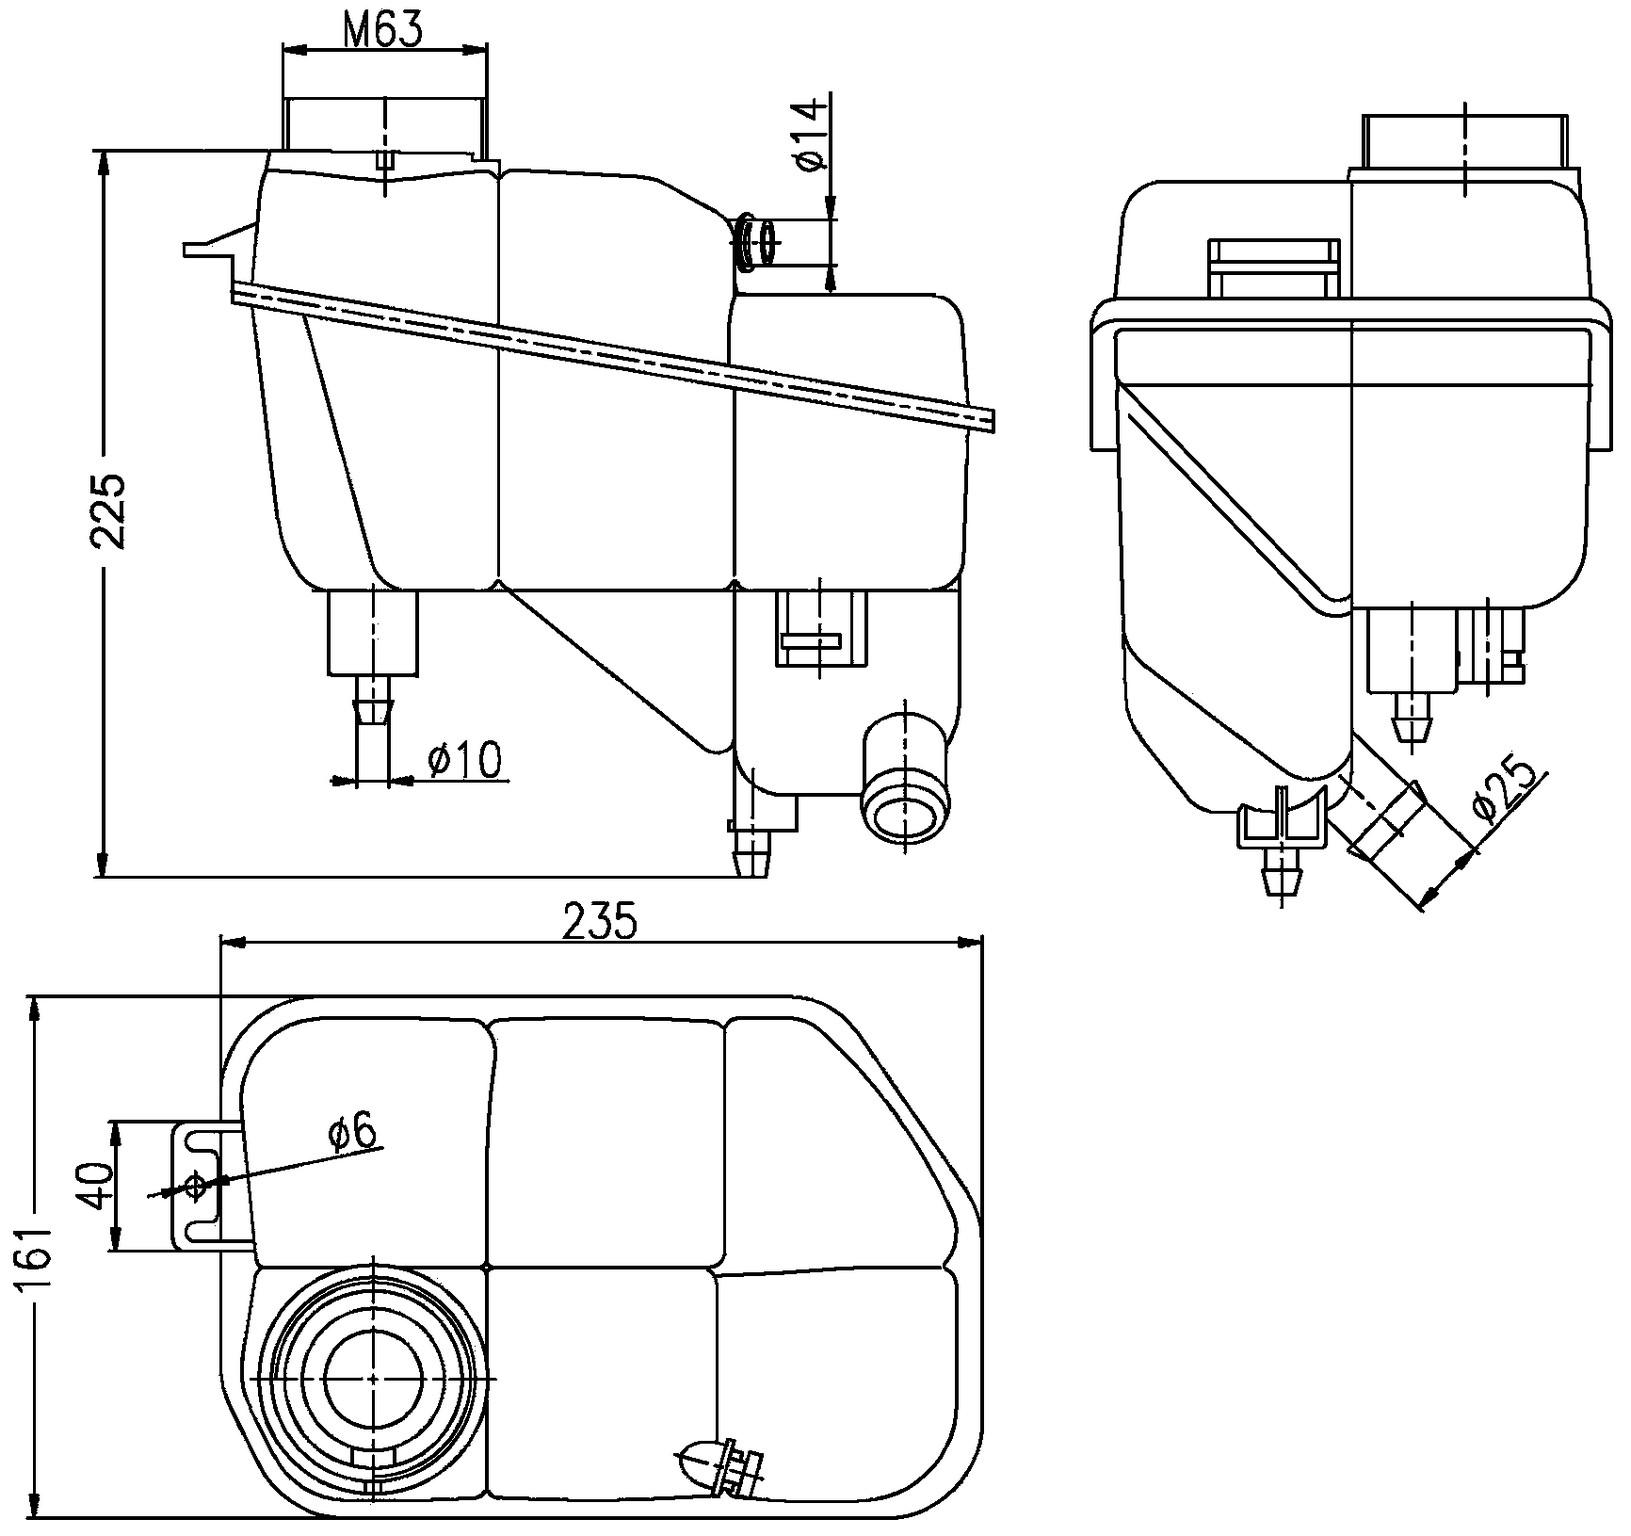 2005 Mercedes-Benz E320 Engine Coolant Reservoir HL 376789701